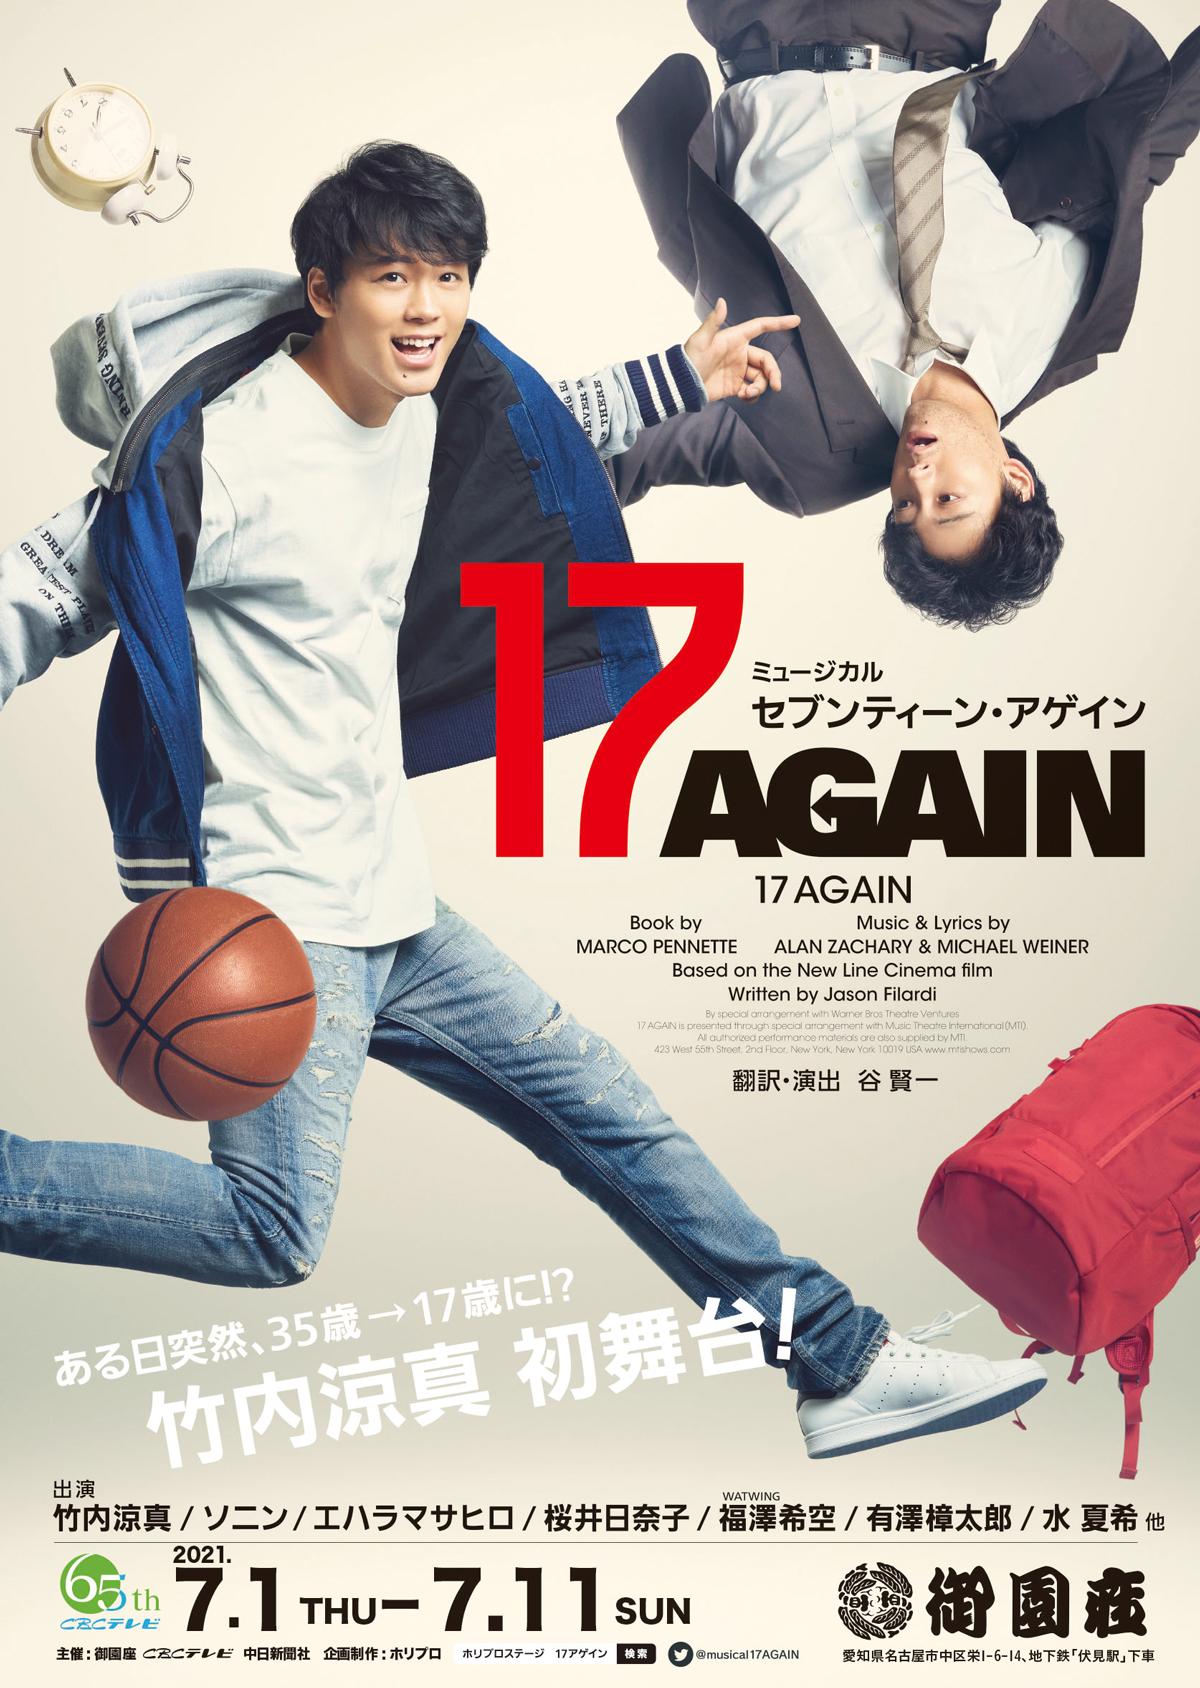 <font color=orange>【先行受付】</font>ミュージカル『17 AGAIN』愛知公演